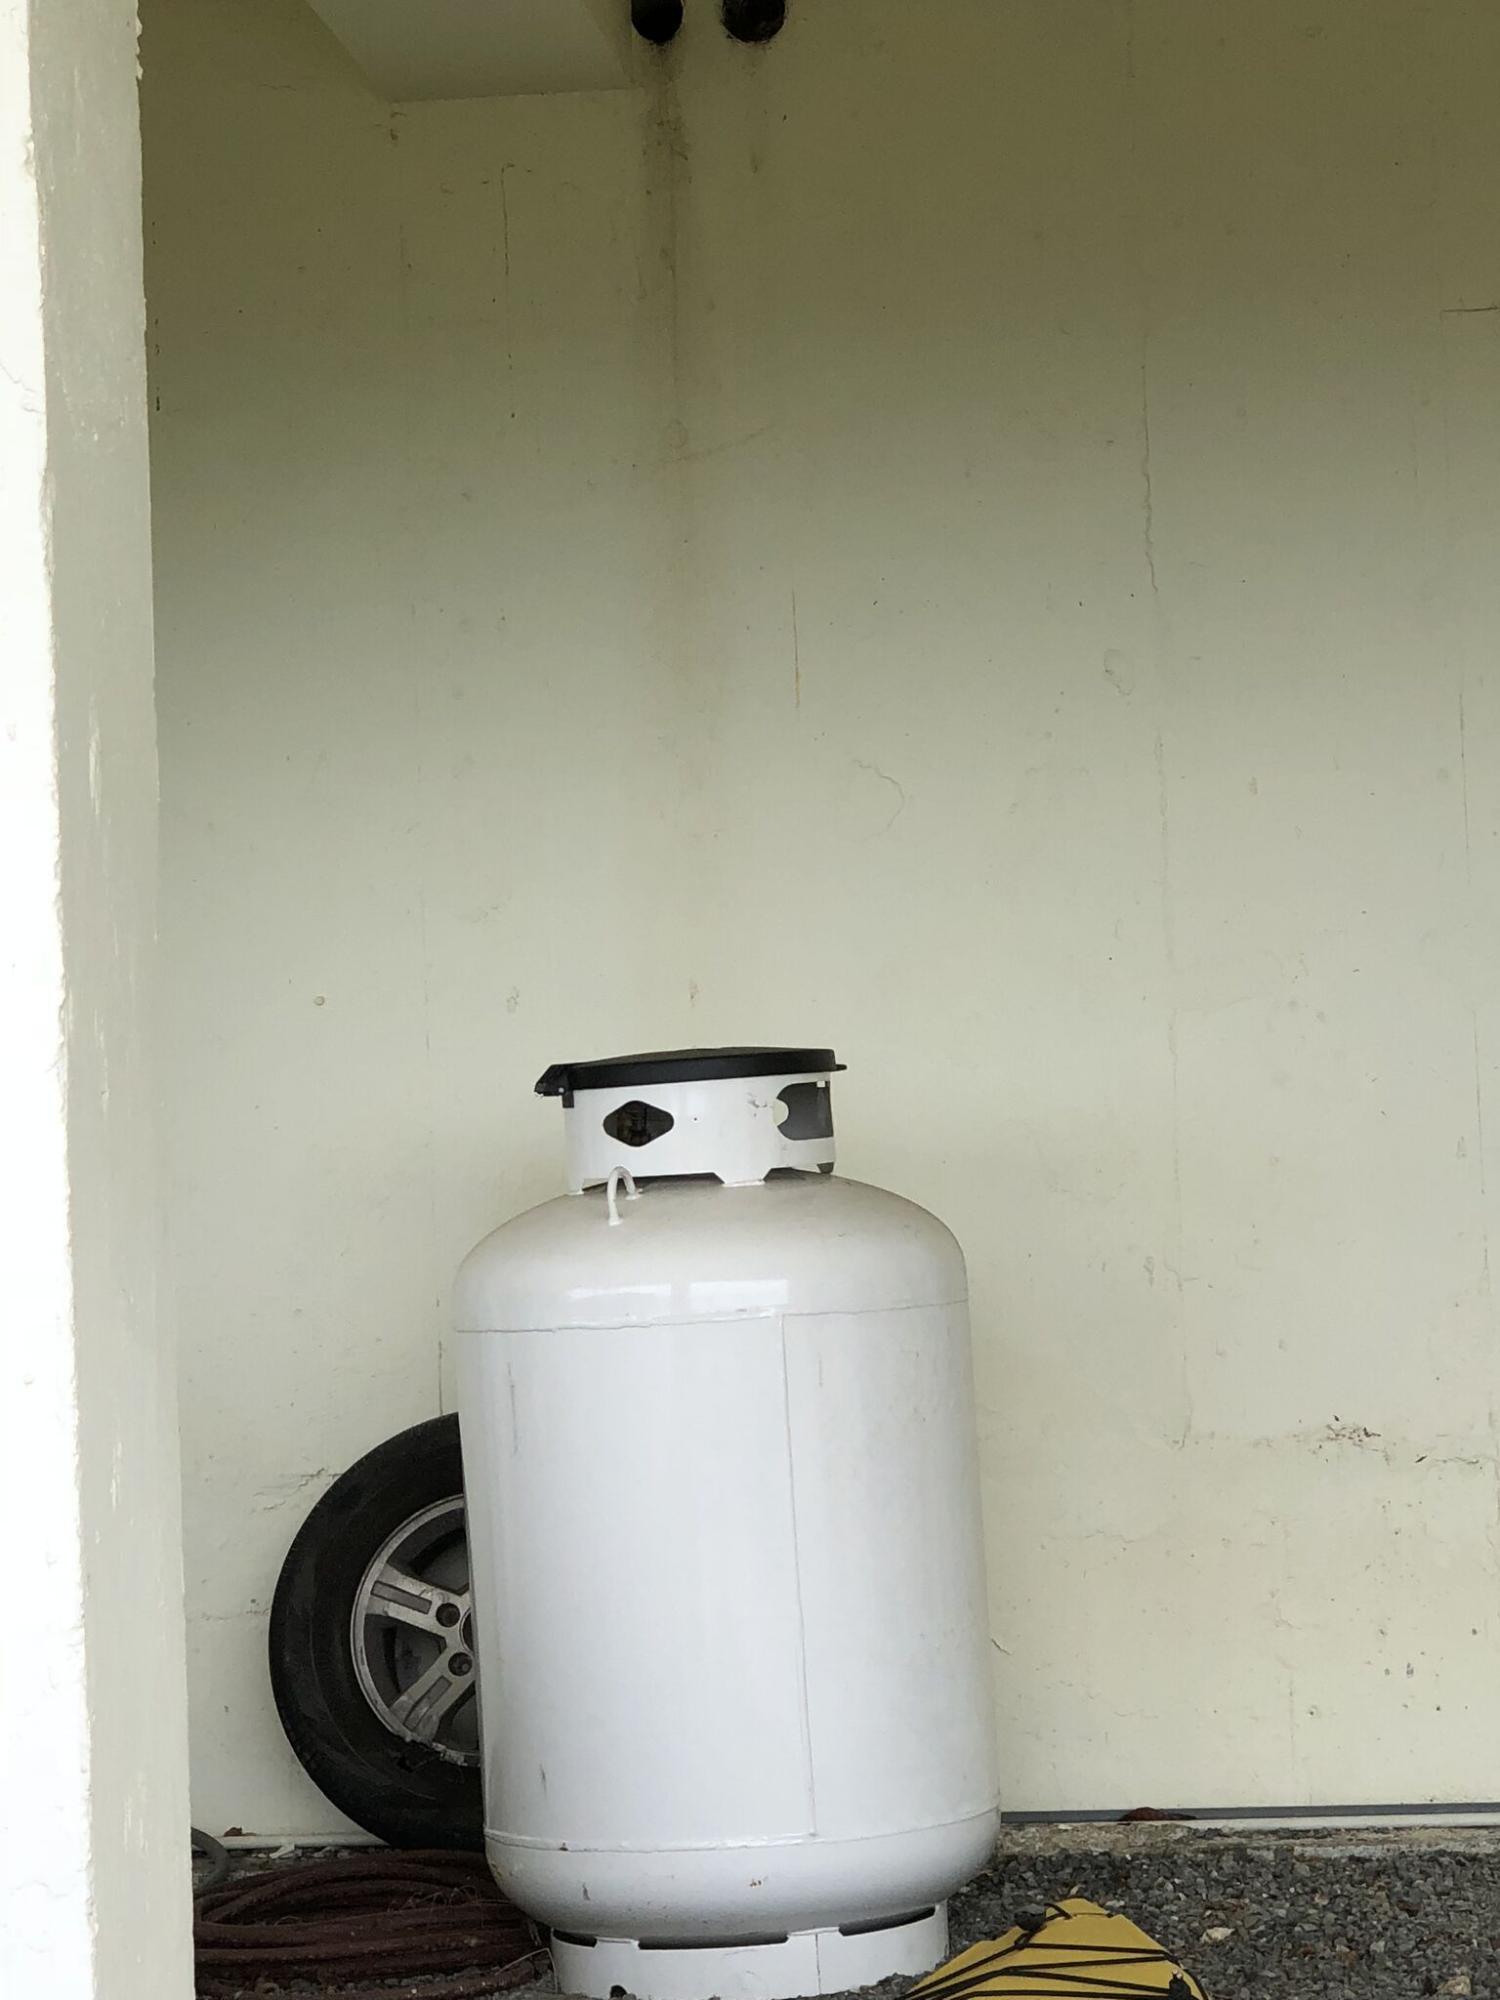 Propane tank for generator